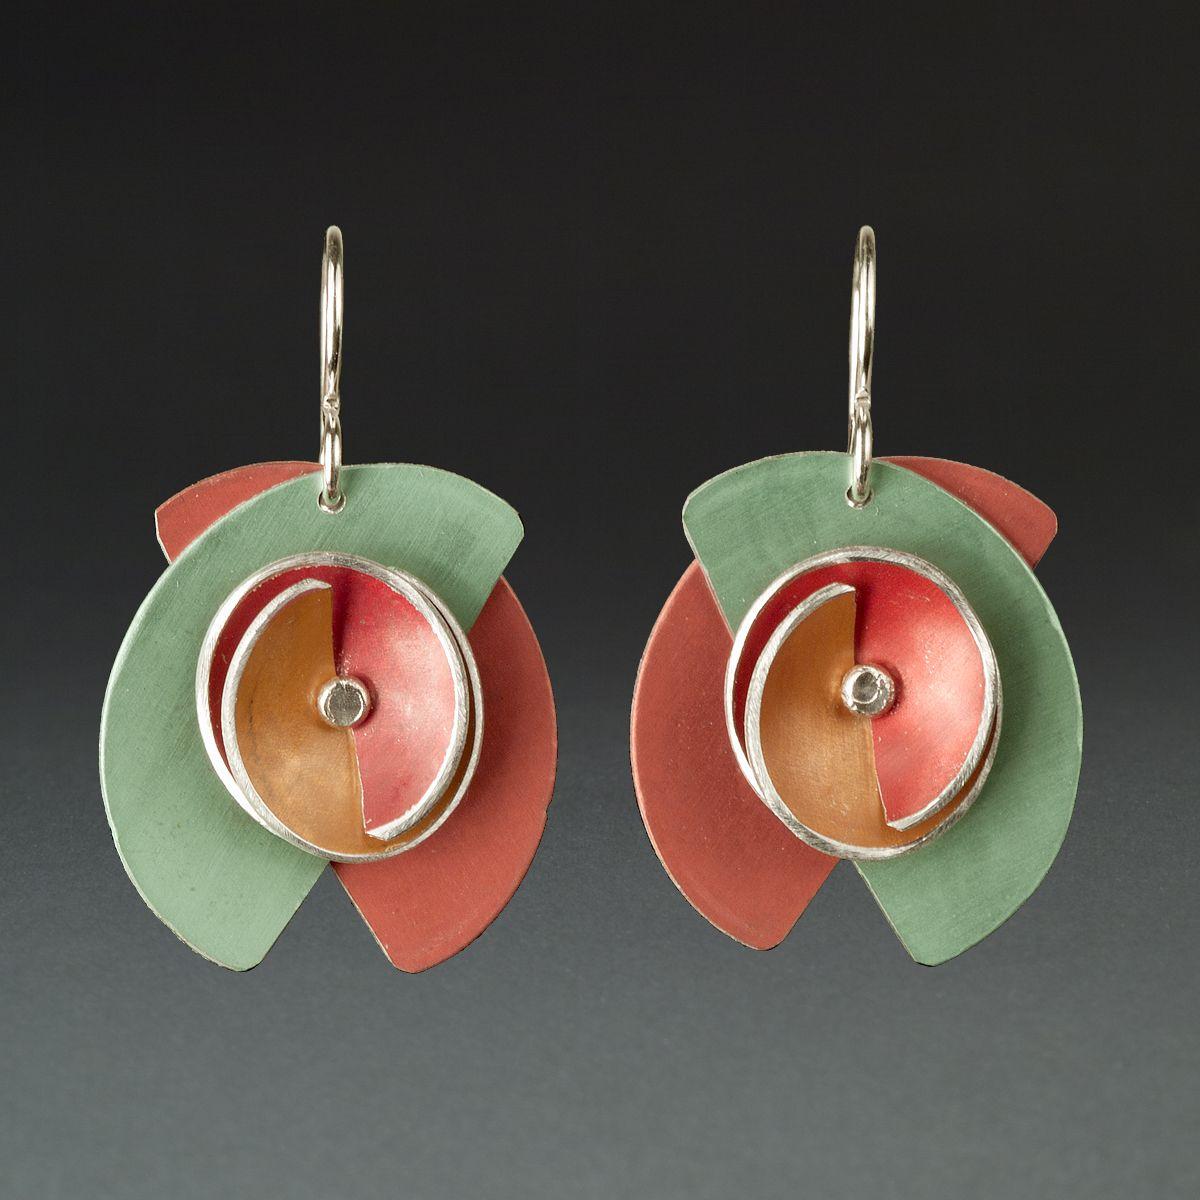 B Rust, Lime, Orange, Red Anodized aluminum jewelry